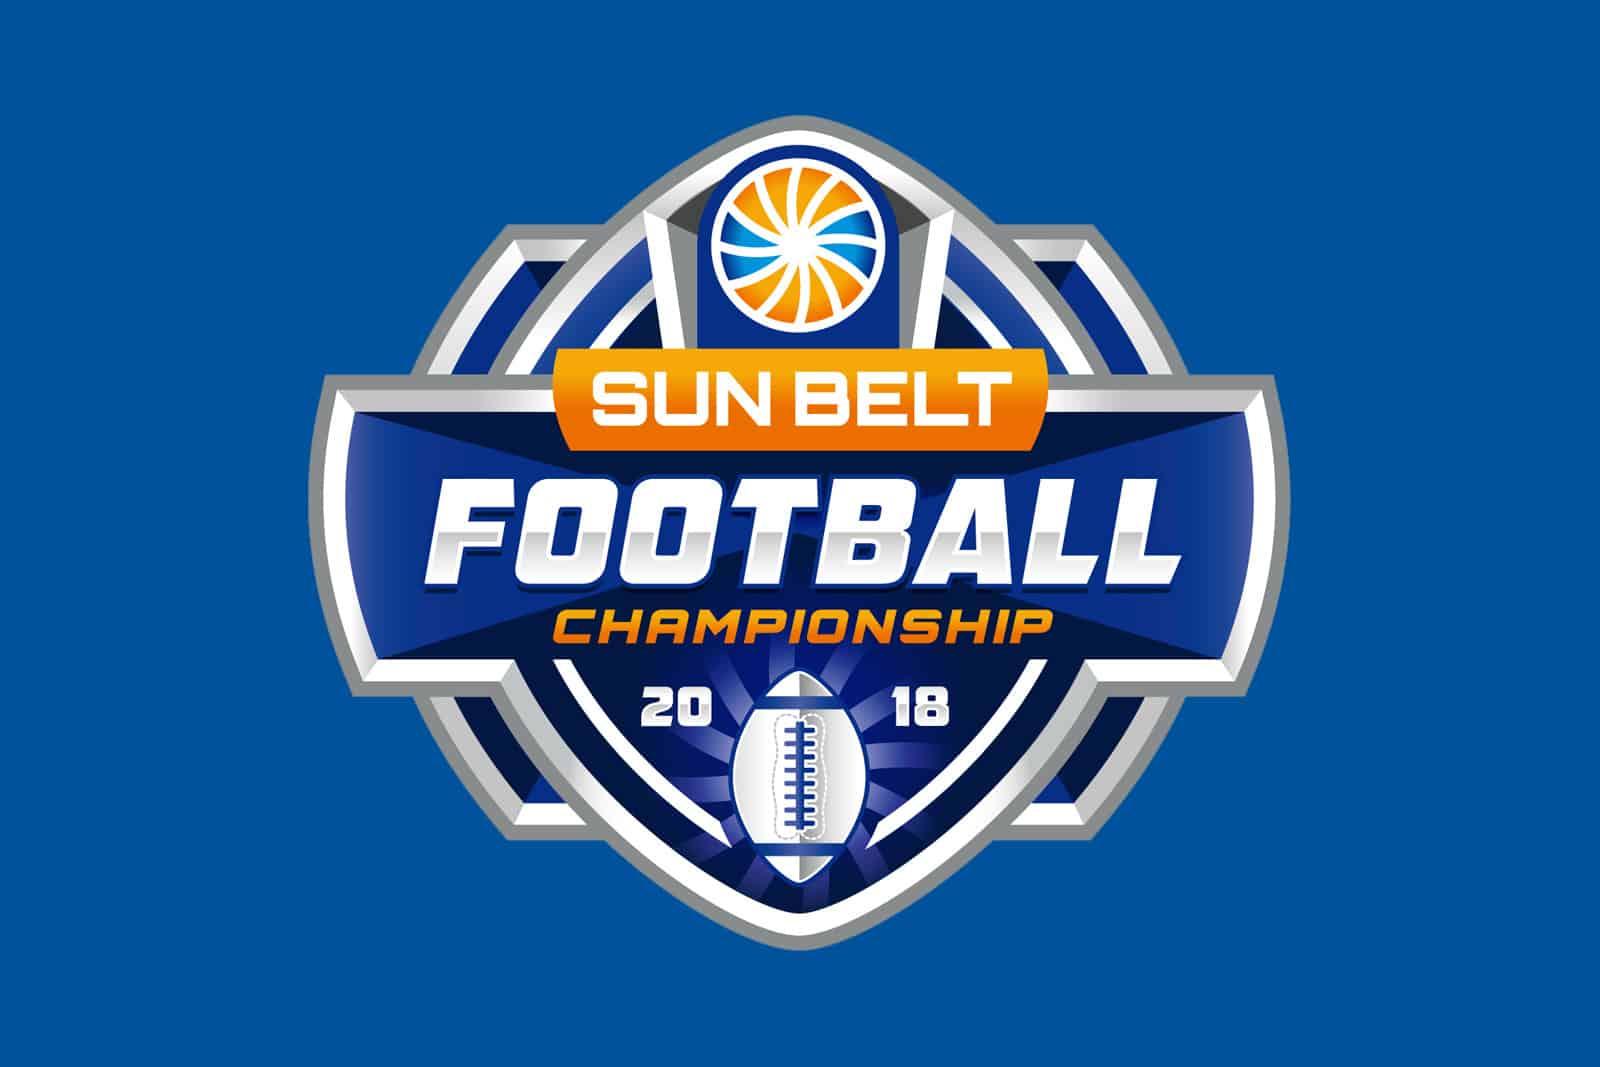 2018 Sun Belt Championship Game